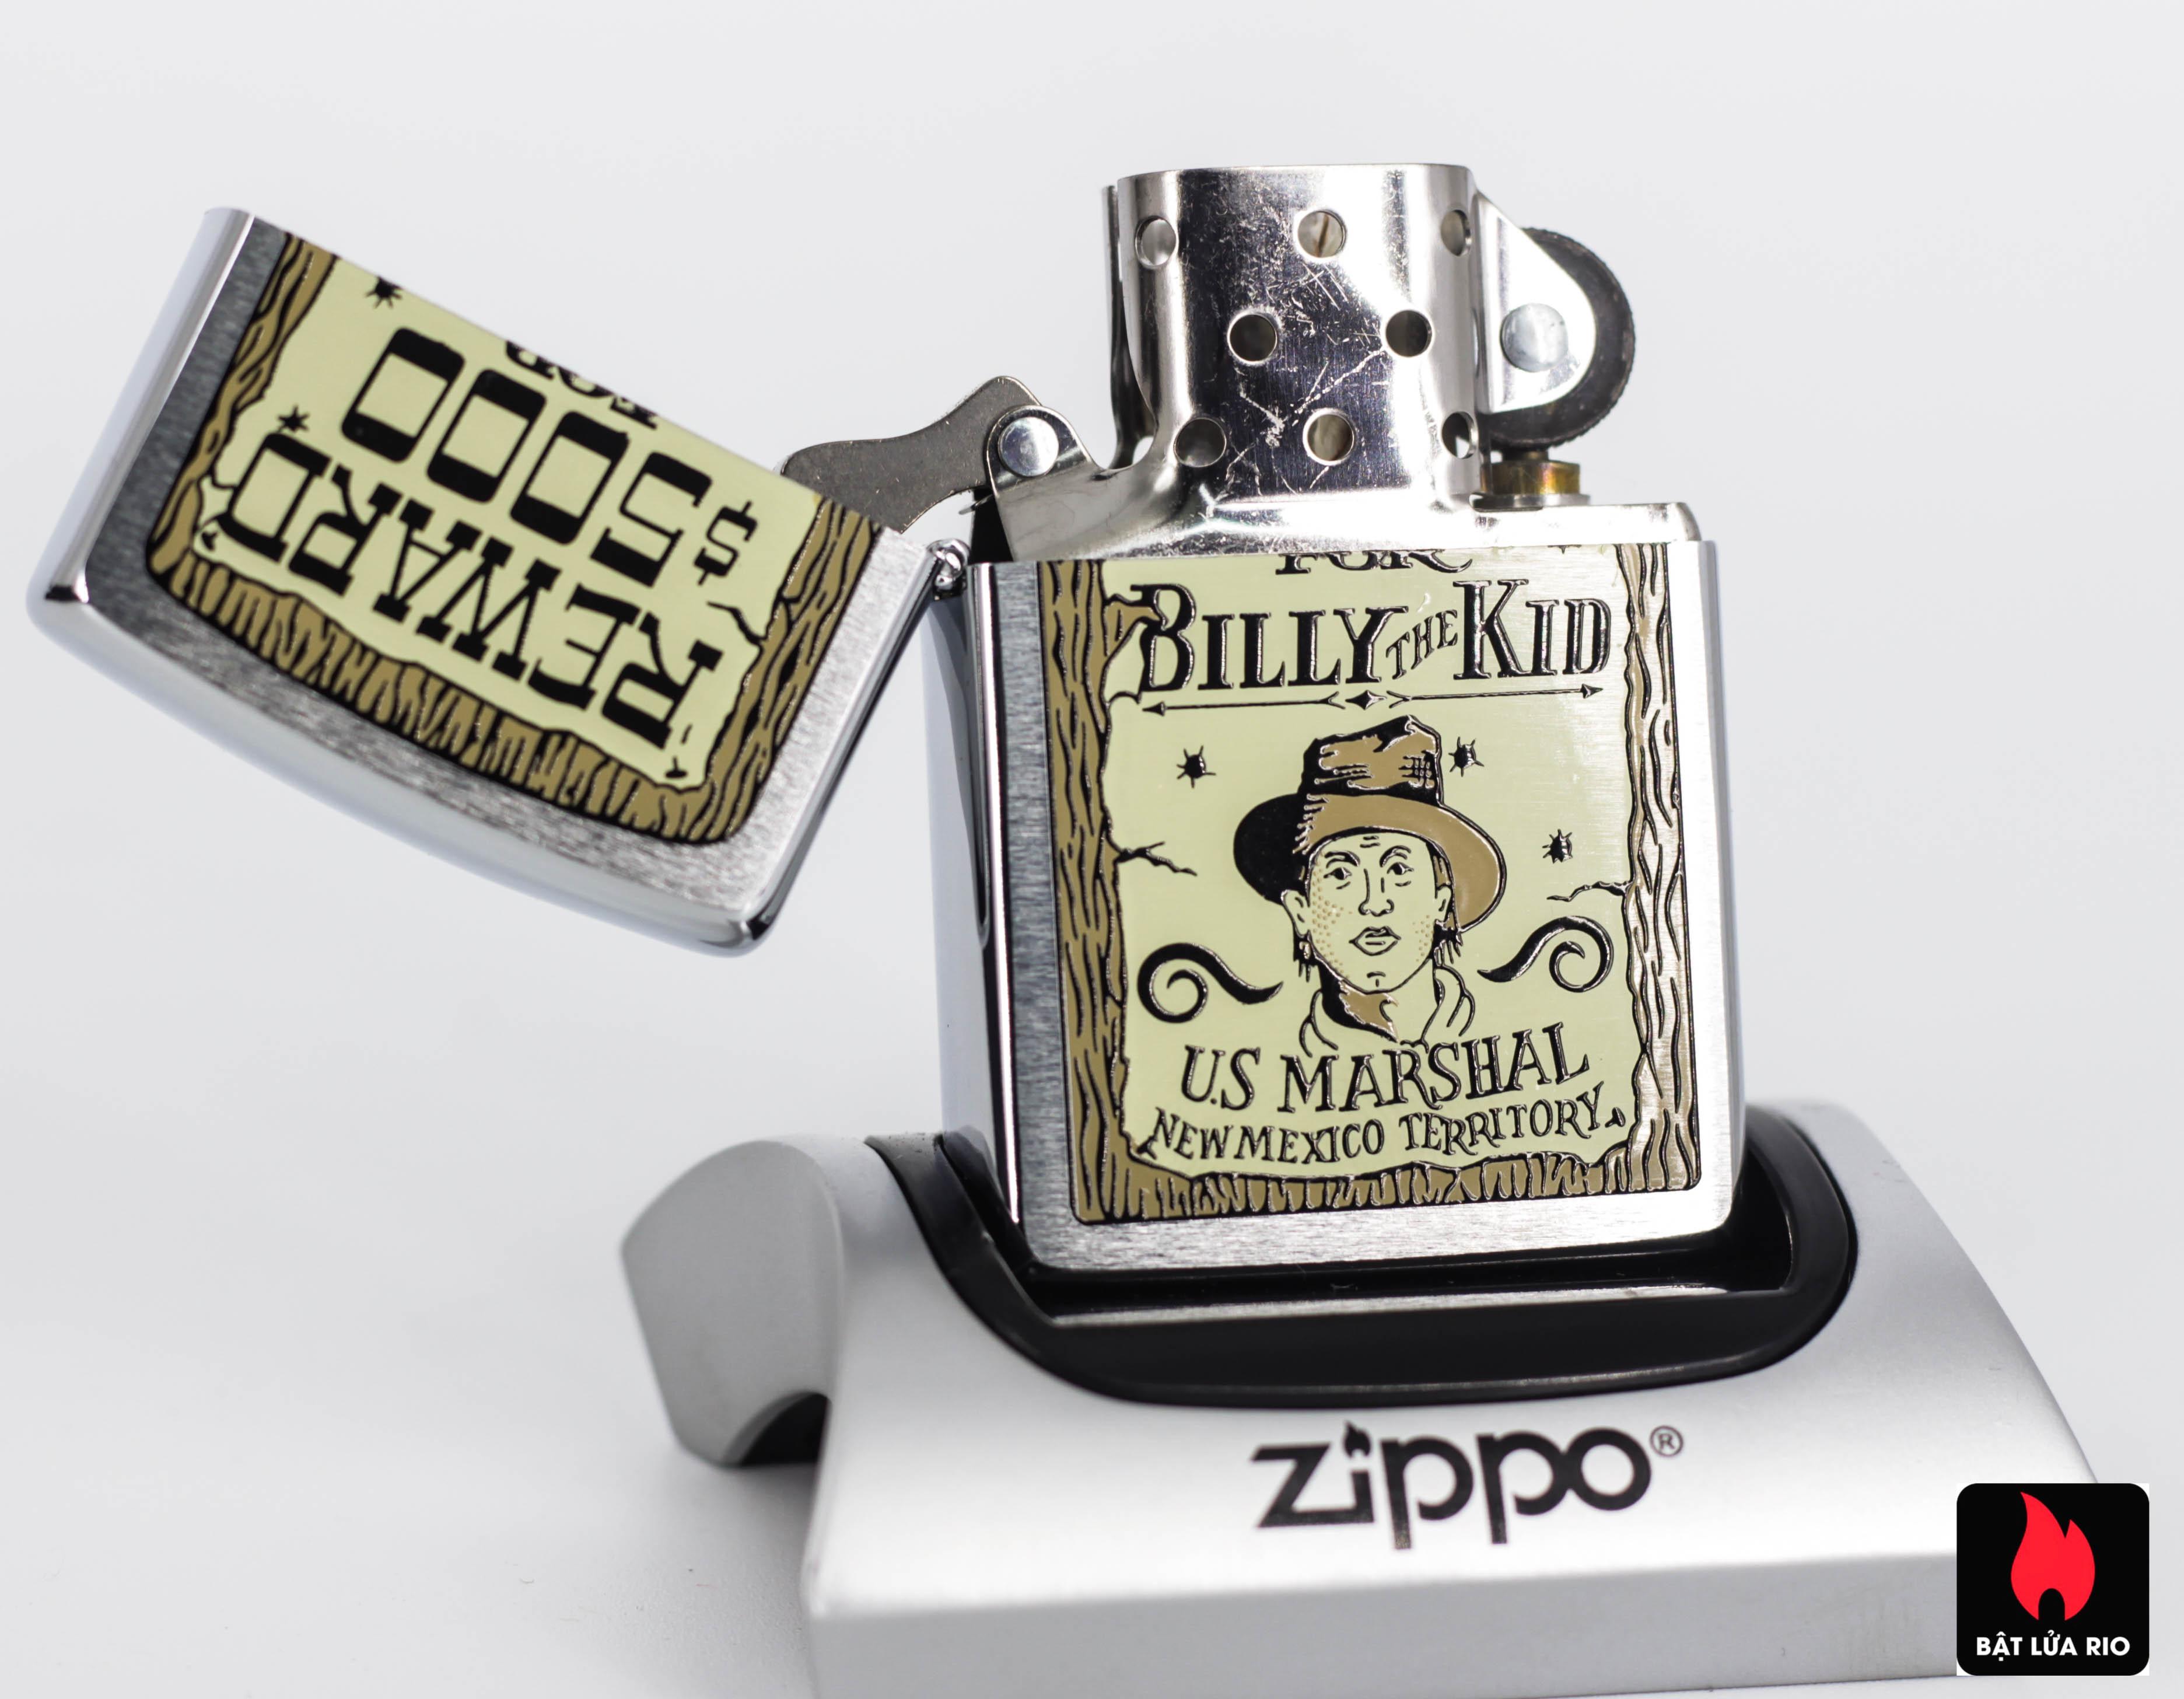 ZIPPO LA MÃ 1995 - REWARD $5000 - BILLY THE KID